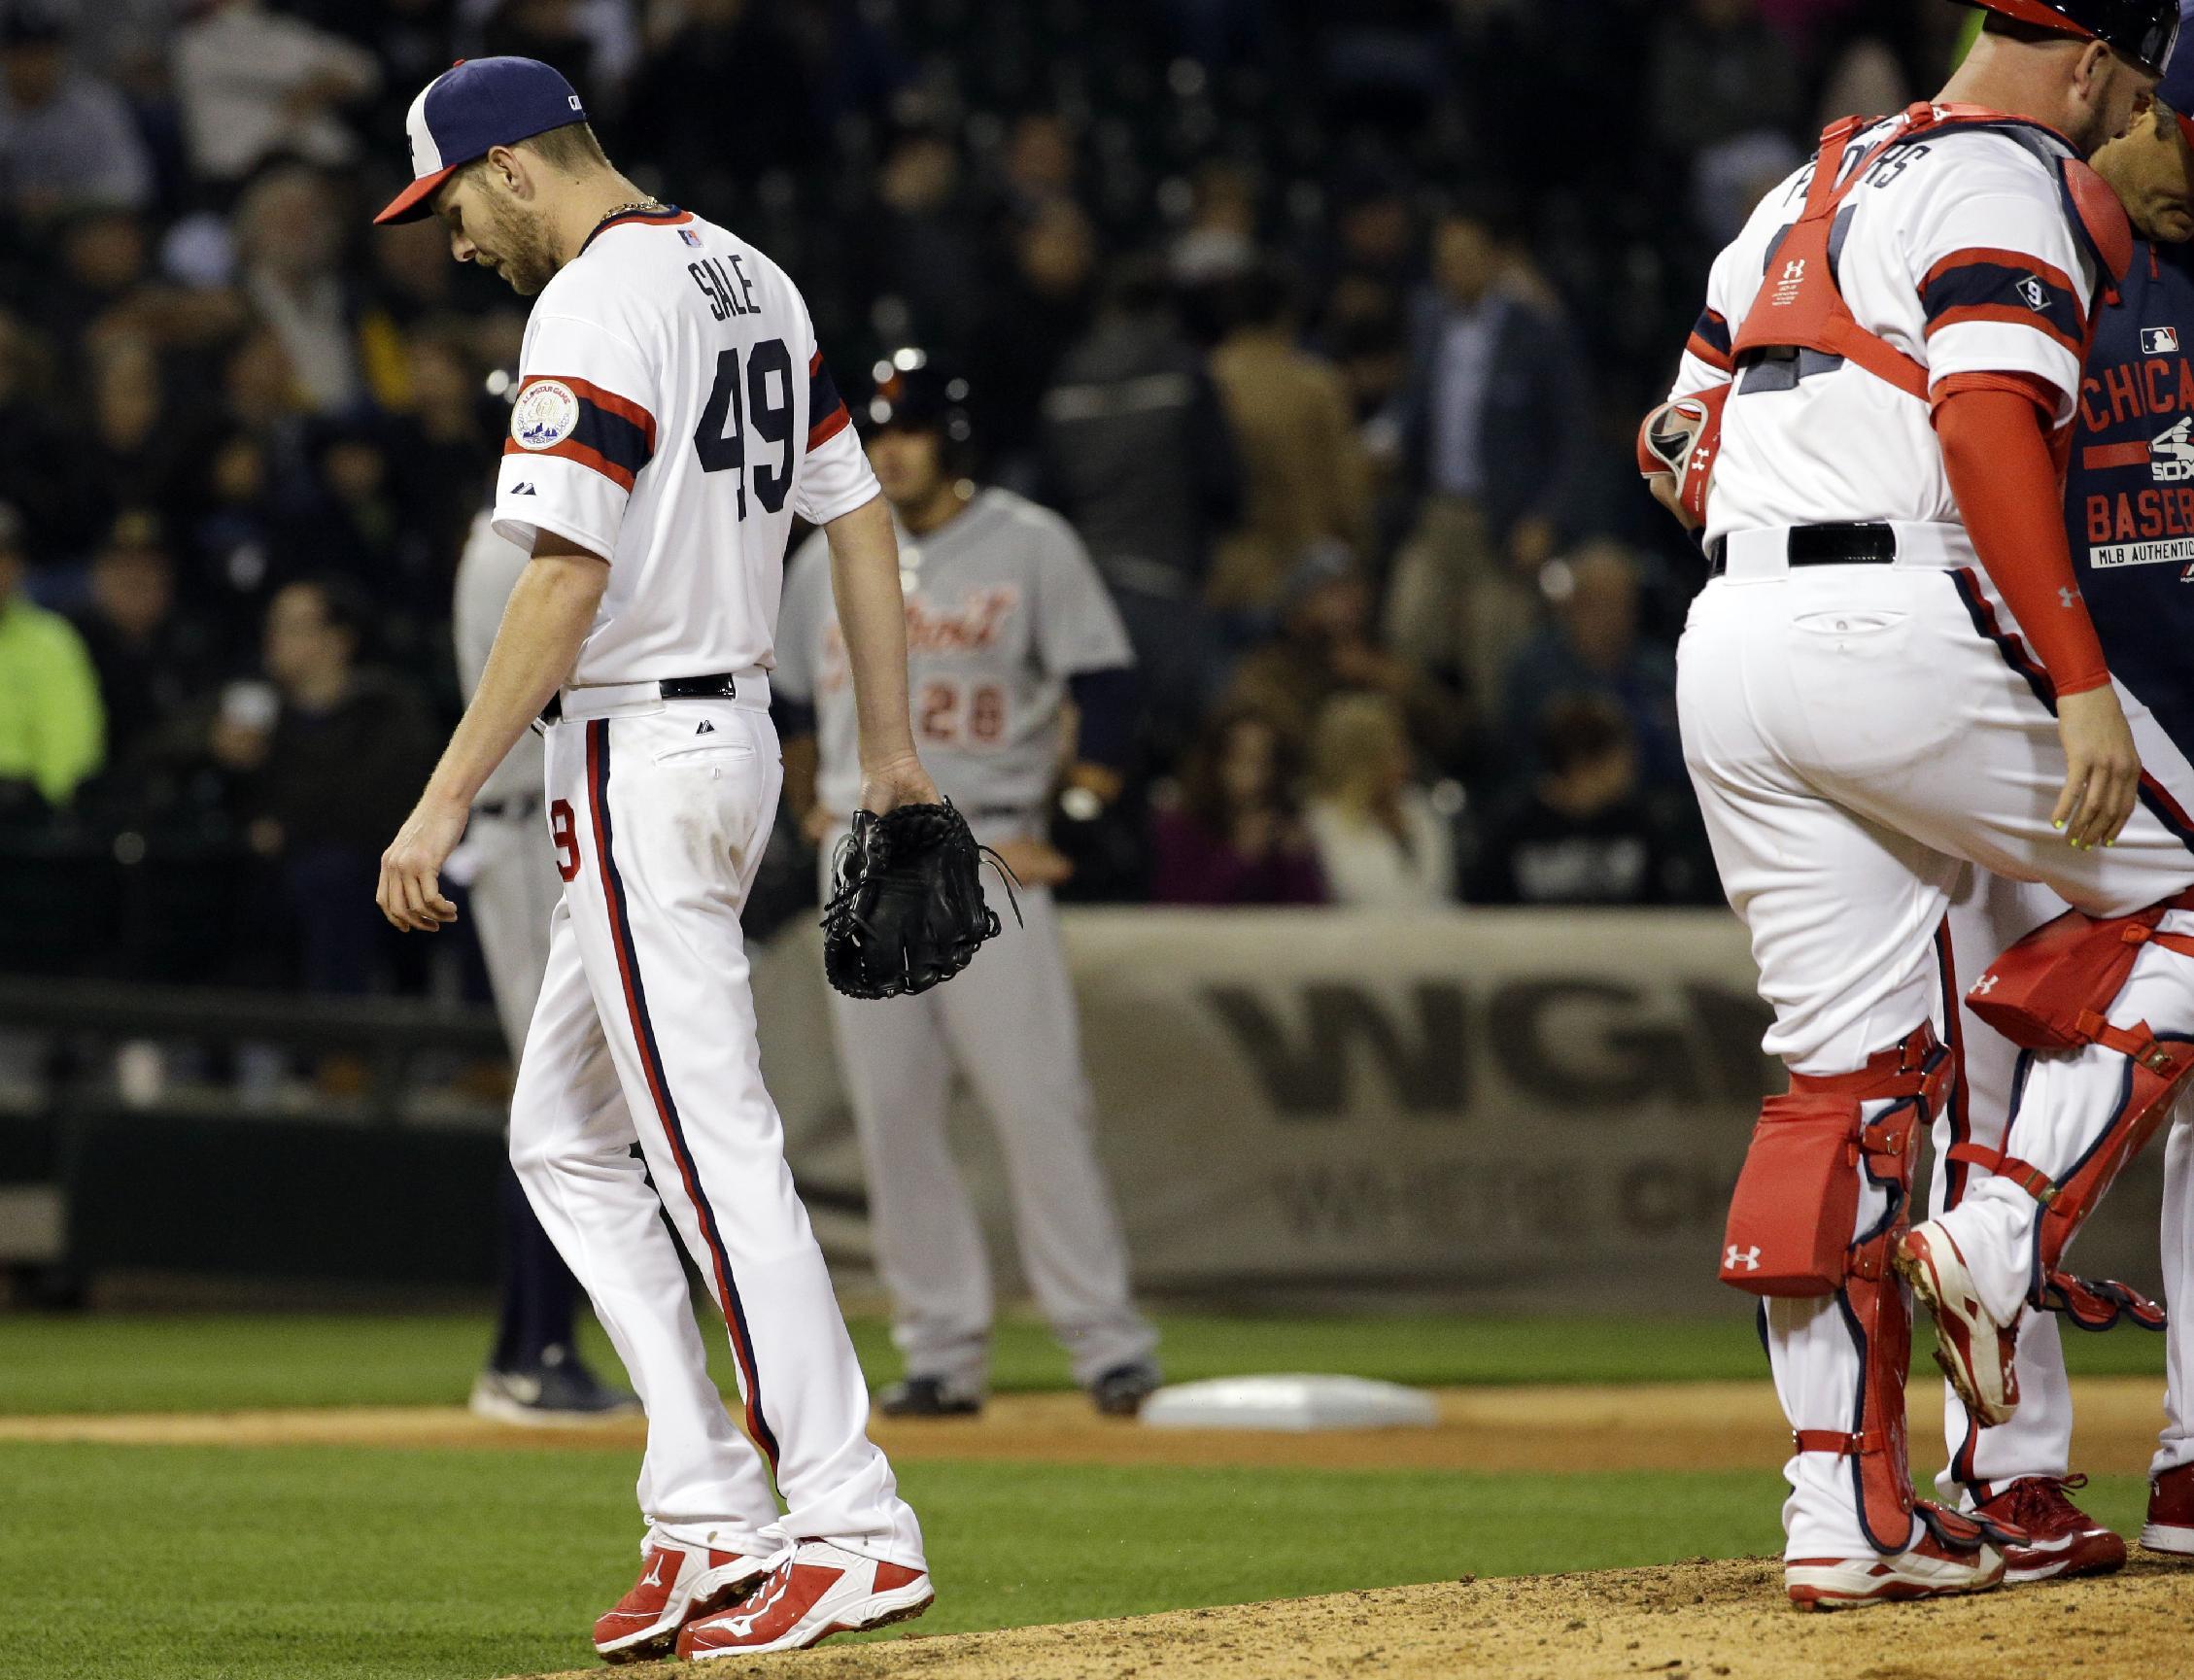 Cabrera, White Sox rally for 7-6 win over Tigers